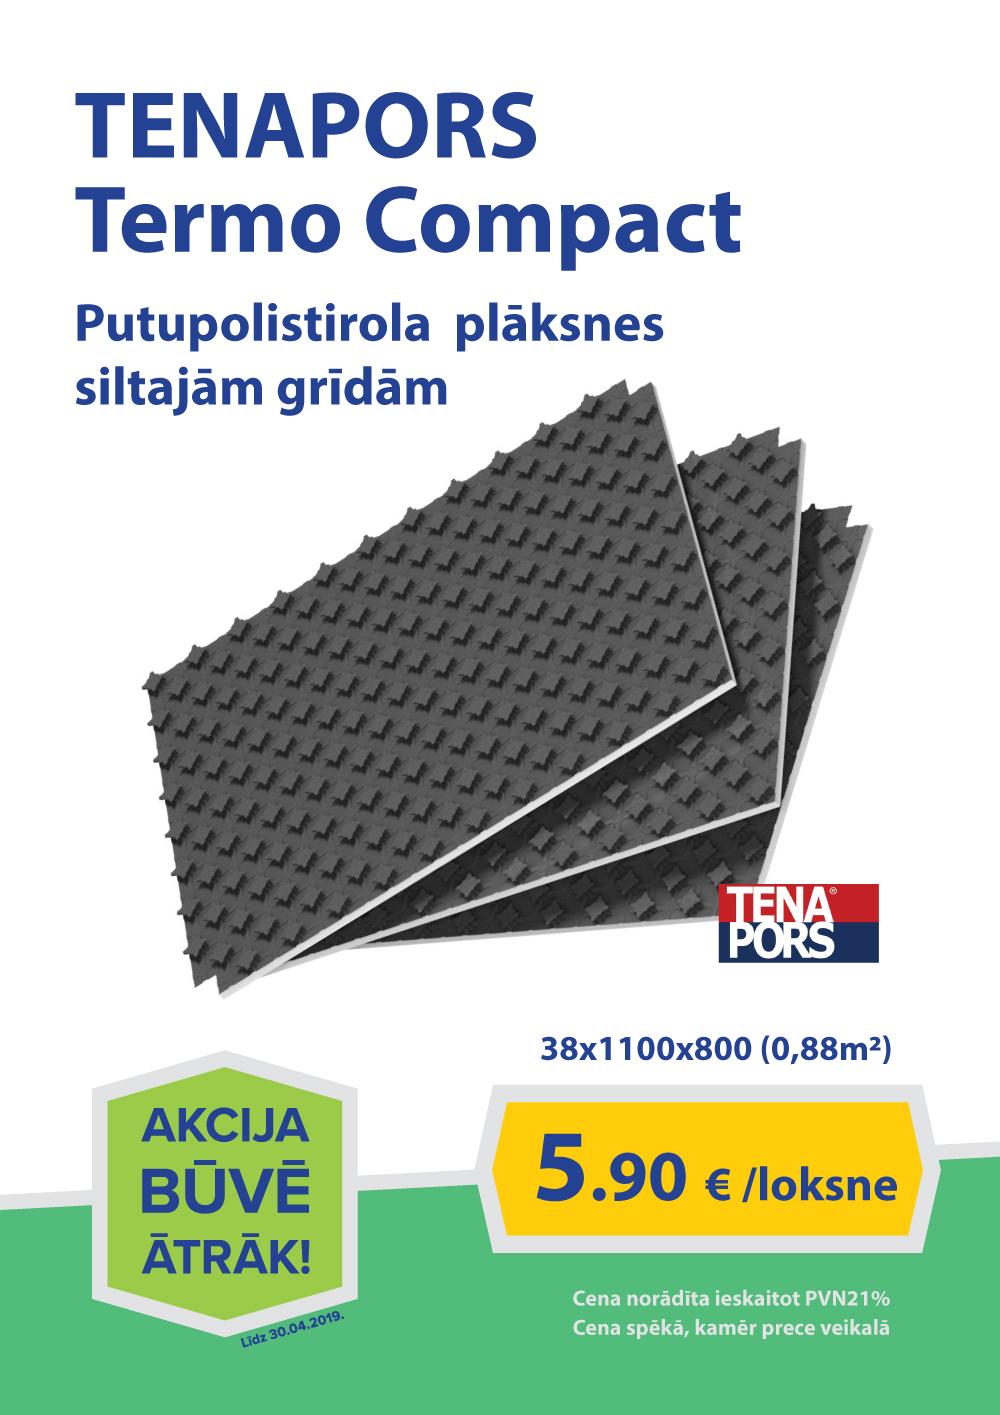 TENAPORS Termo Compact    38x1100x800 (0,88m2)